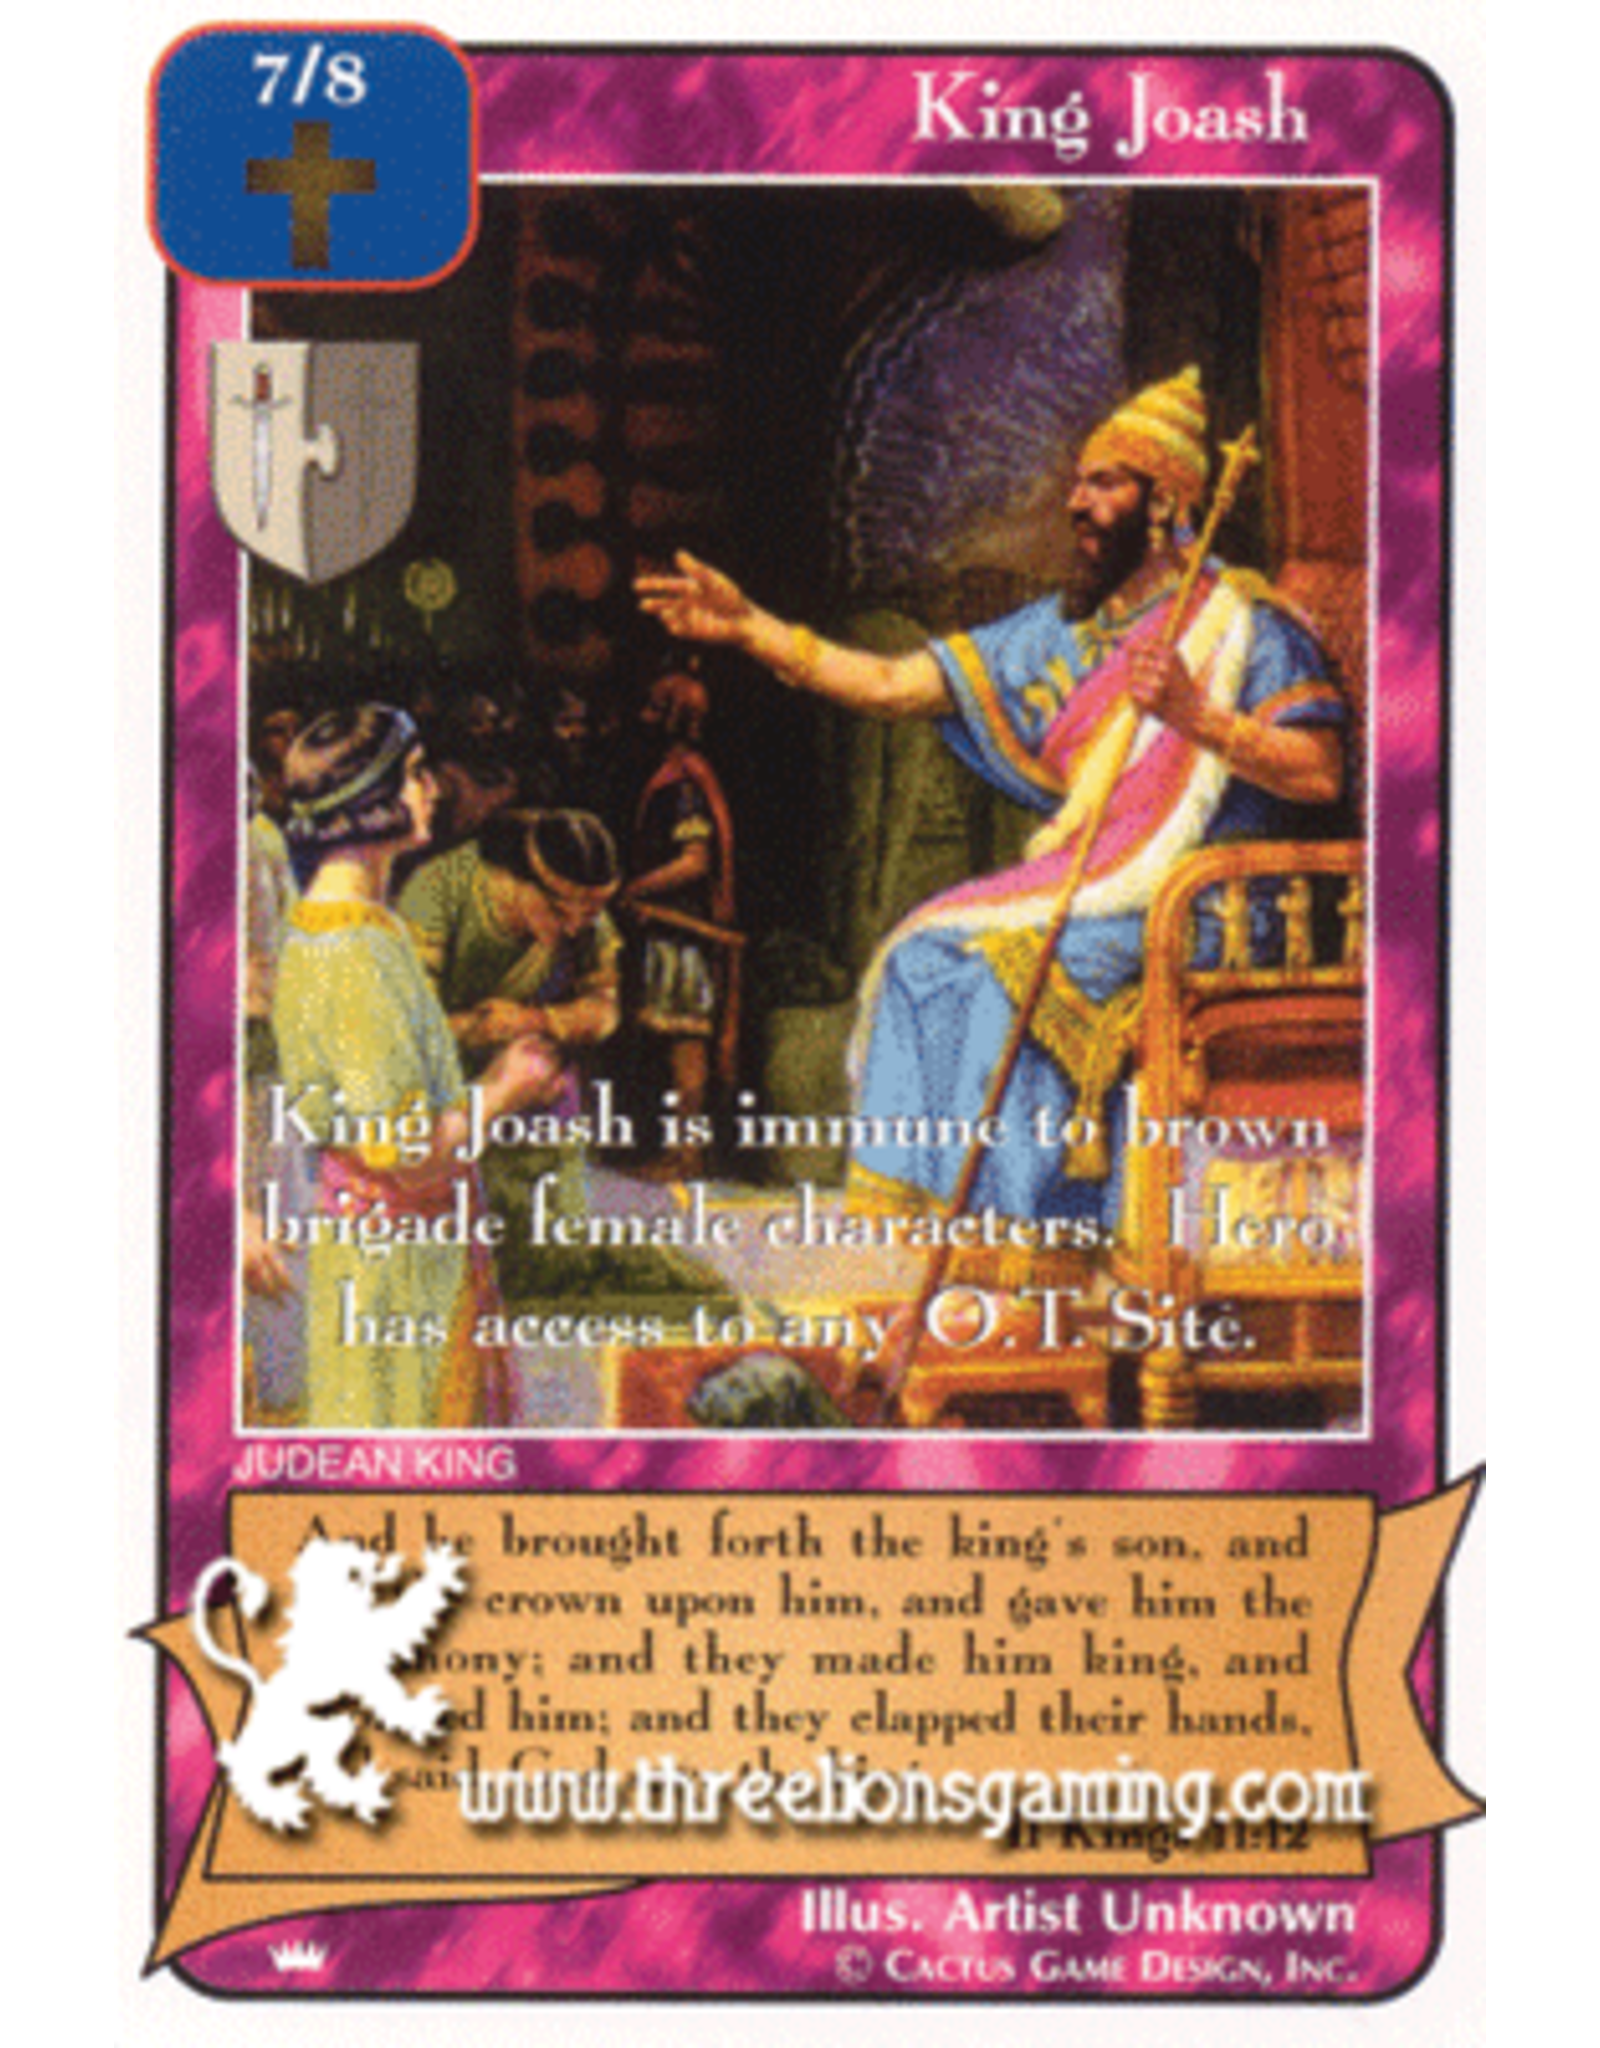 Ki: King Joash